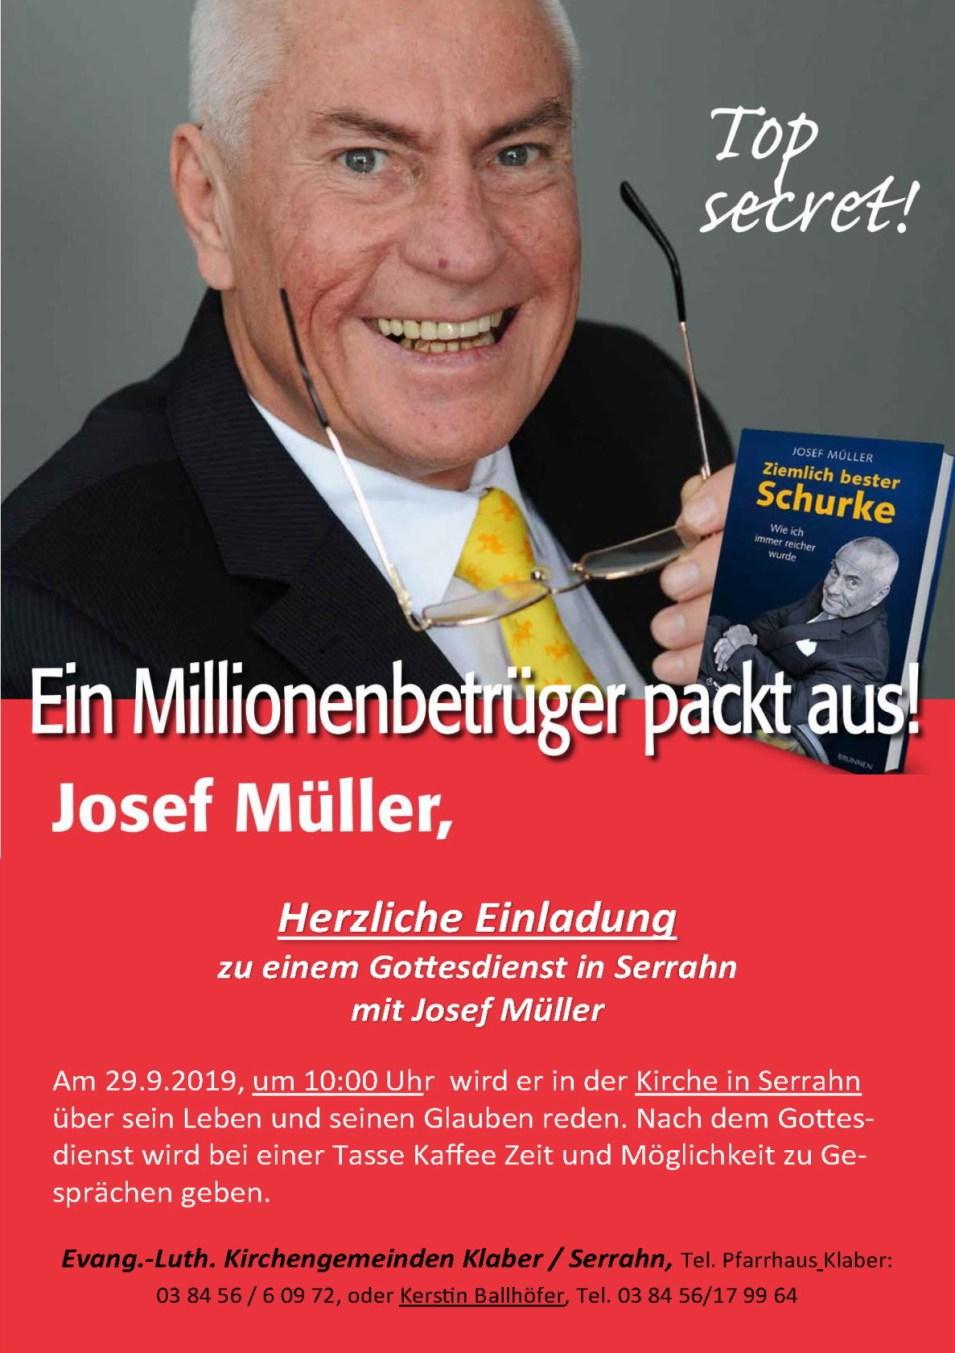 Einladung Gd Serrahn mit Josef Müller